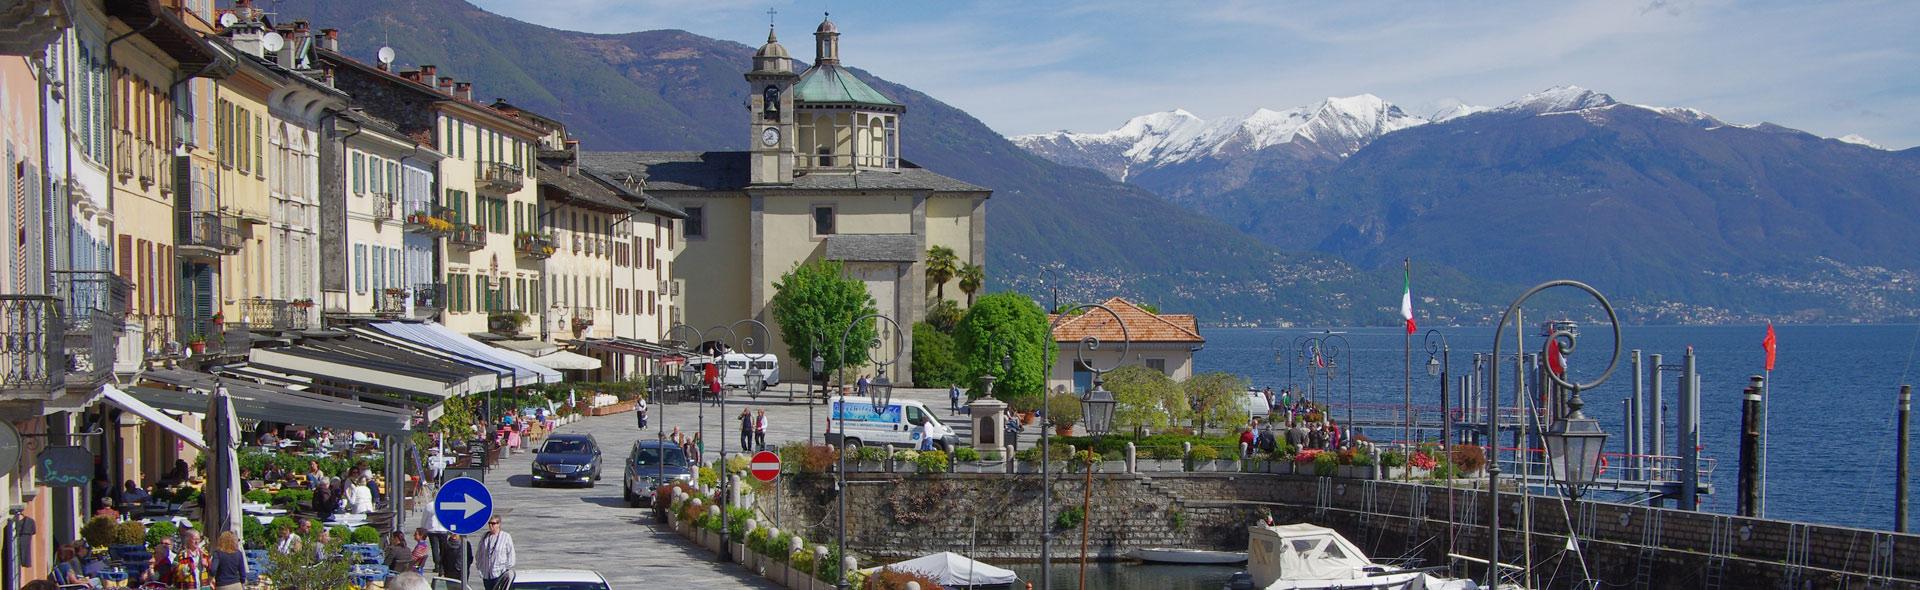 Von Cannobio nach Carmine Superiore